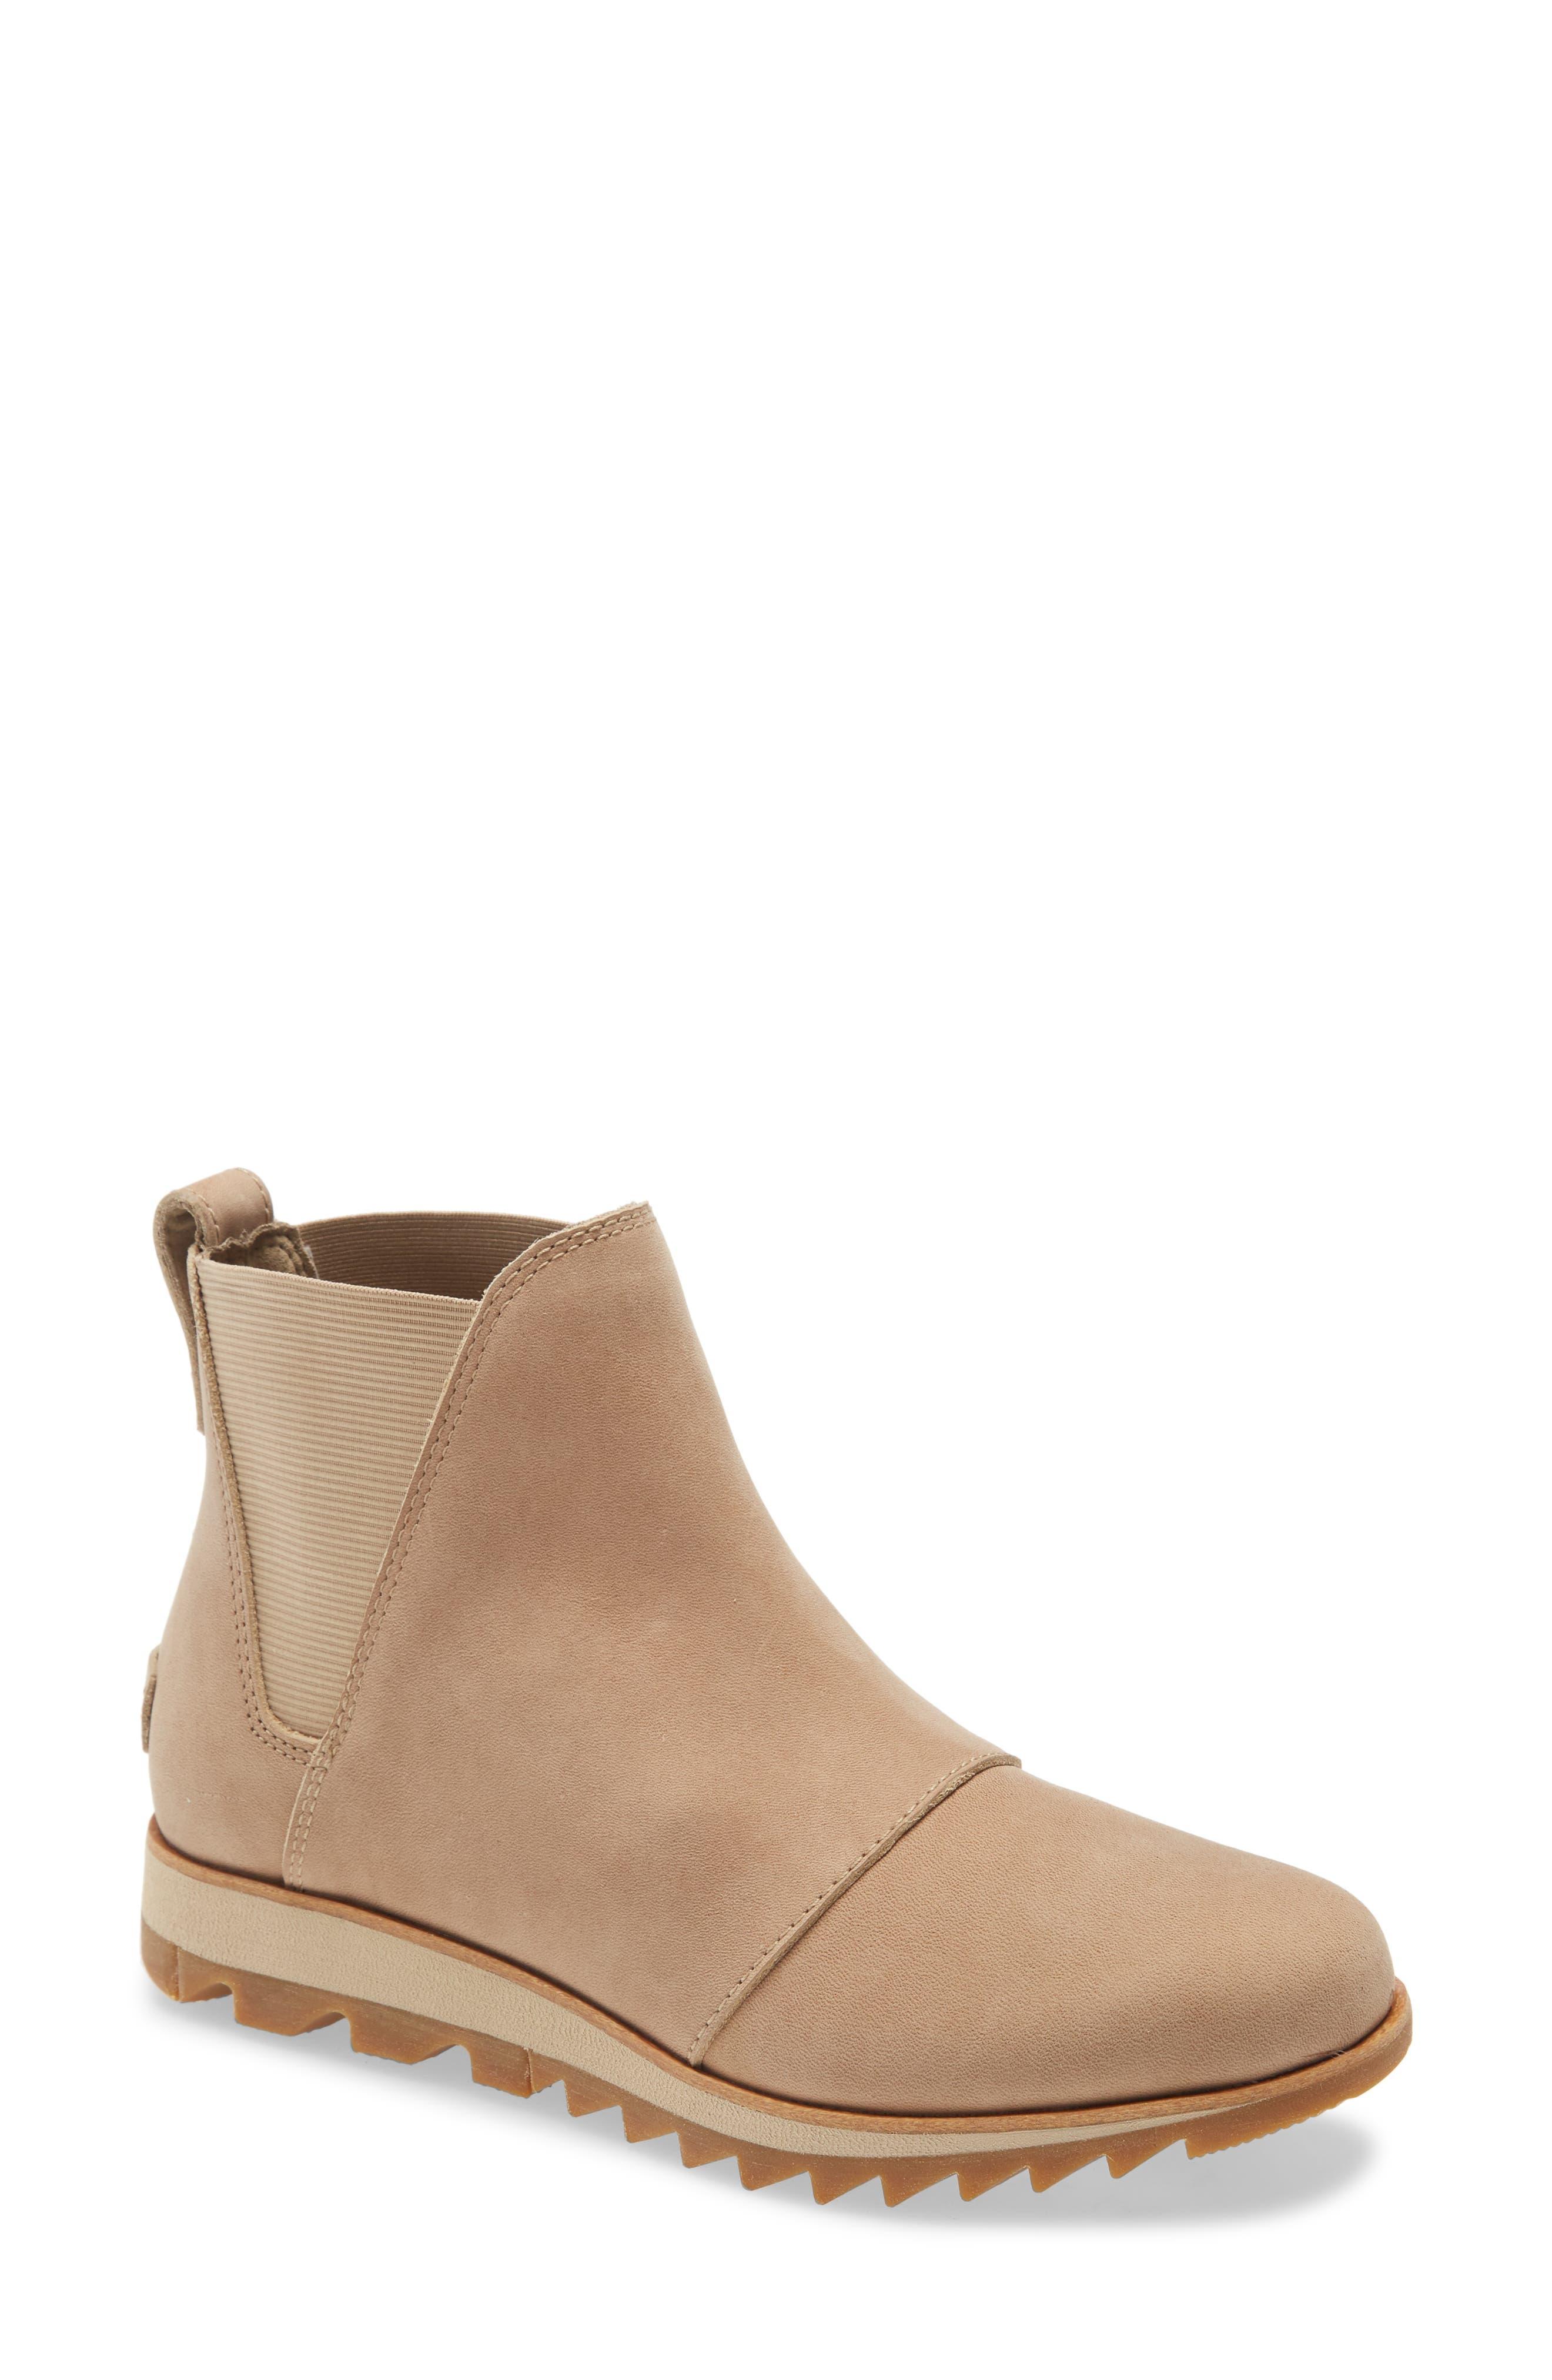 Image of Sorel Harlow Chelsea Boot